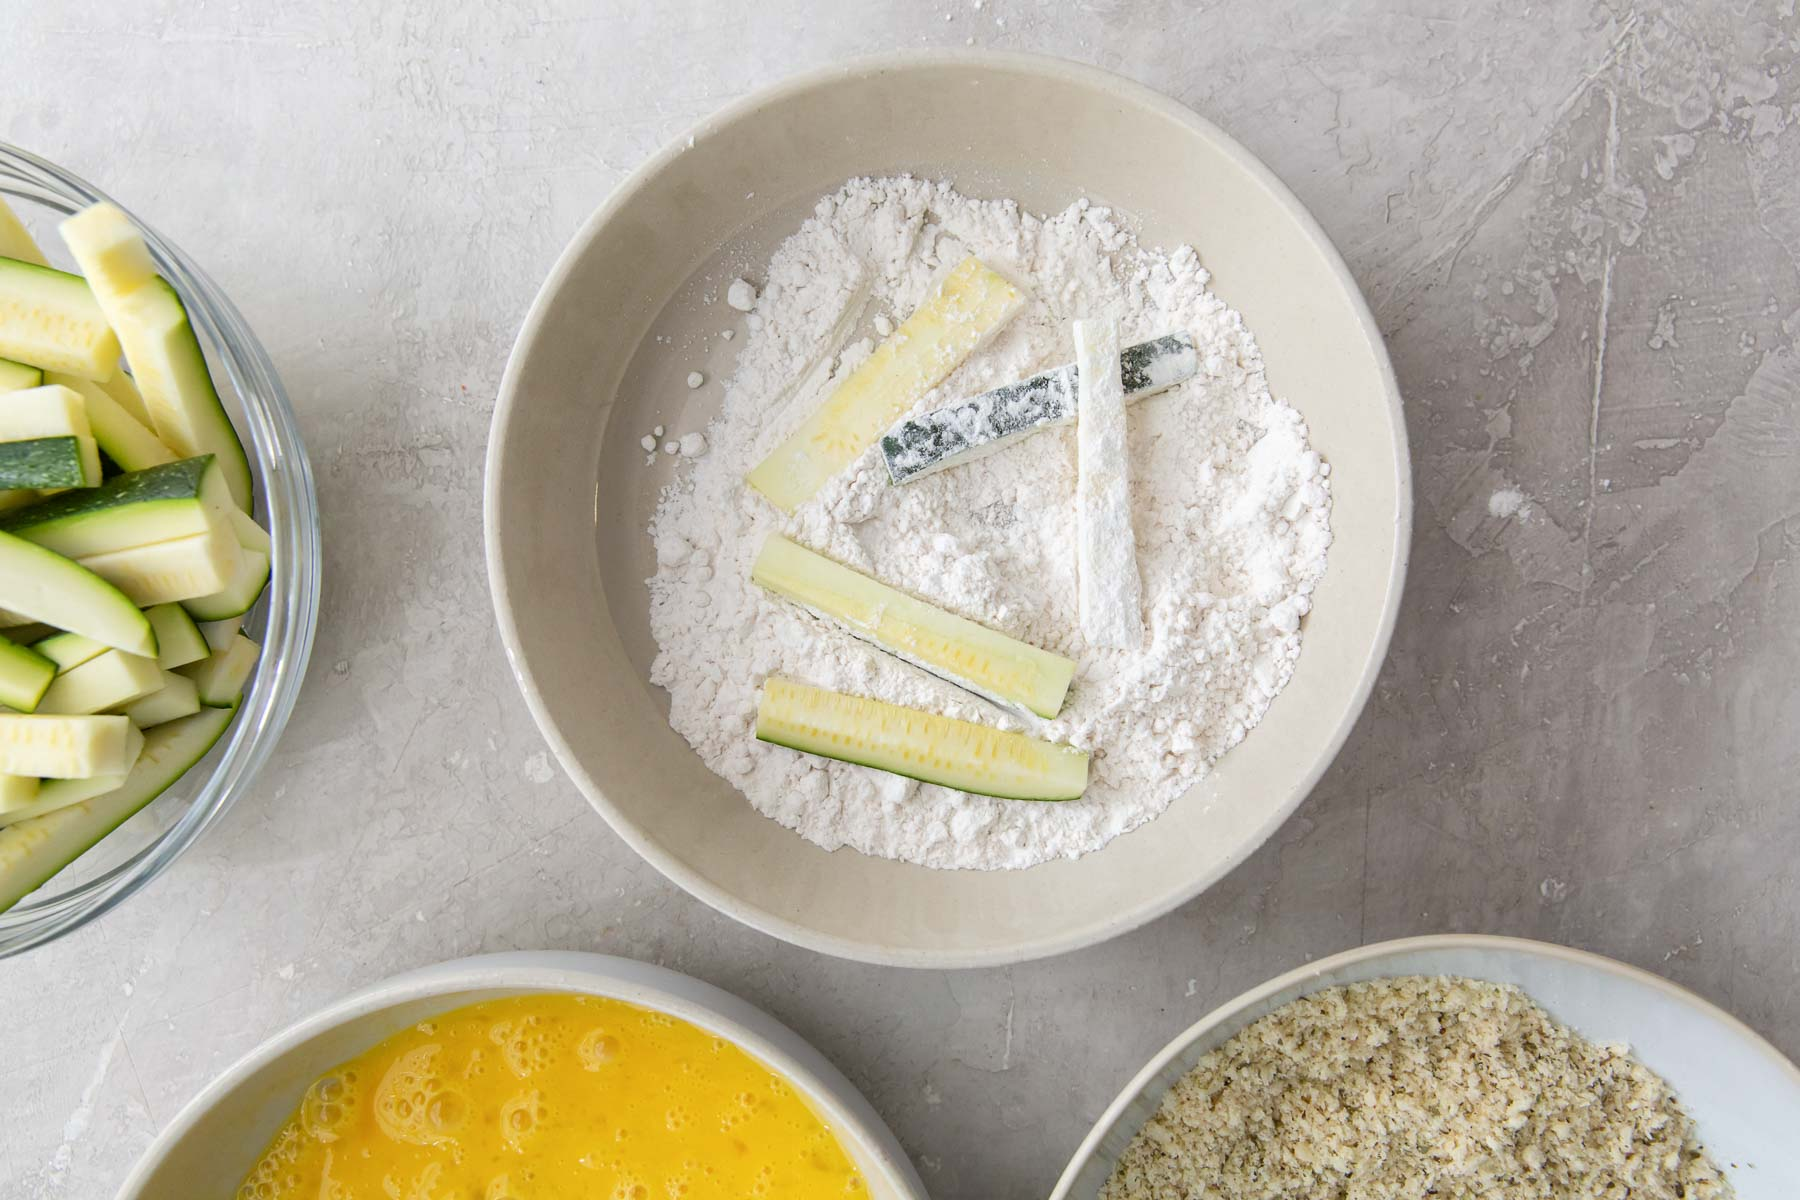 coating zucchini in flour